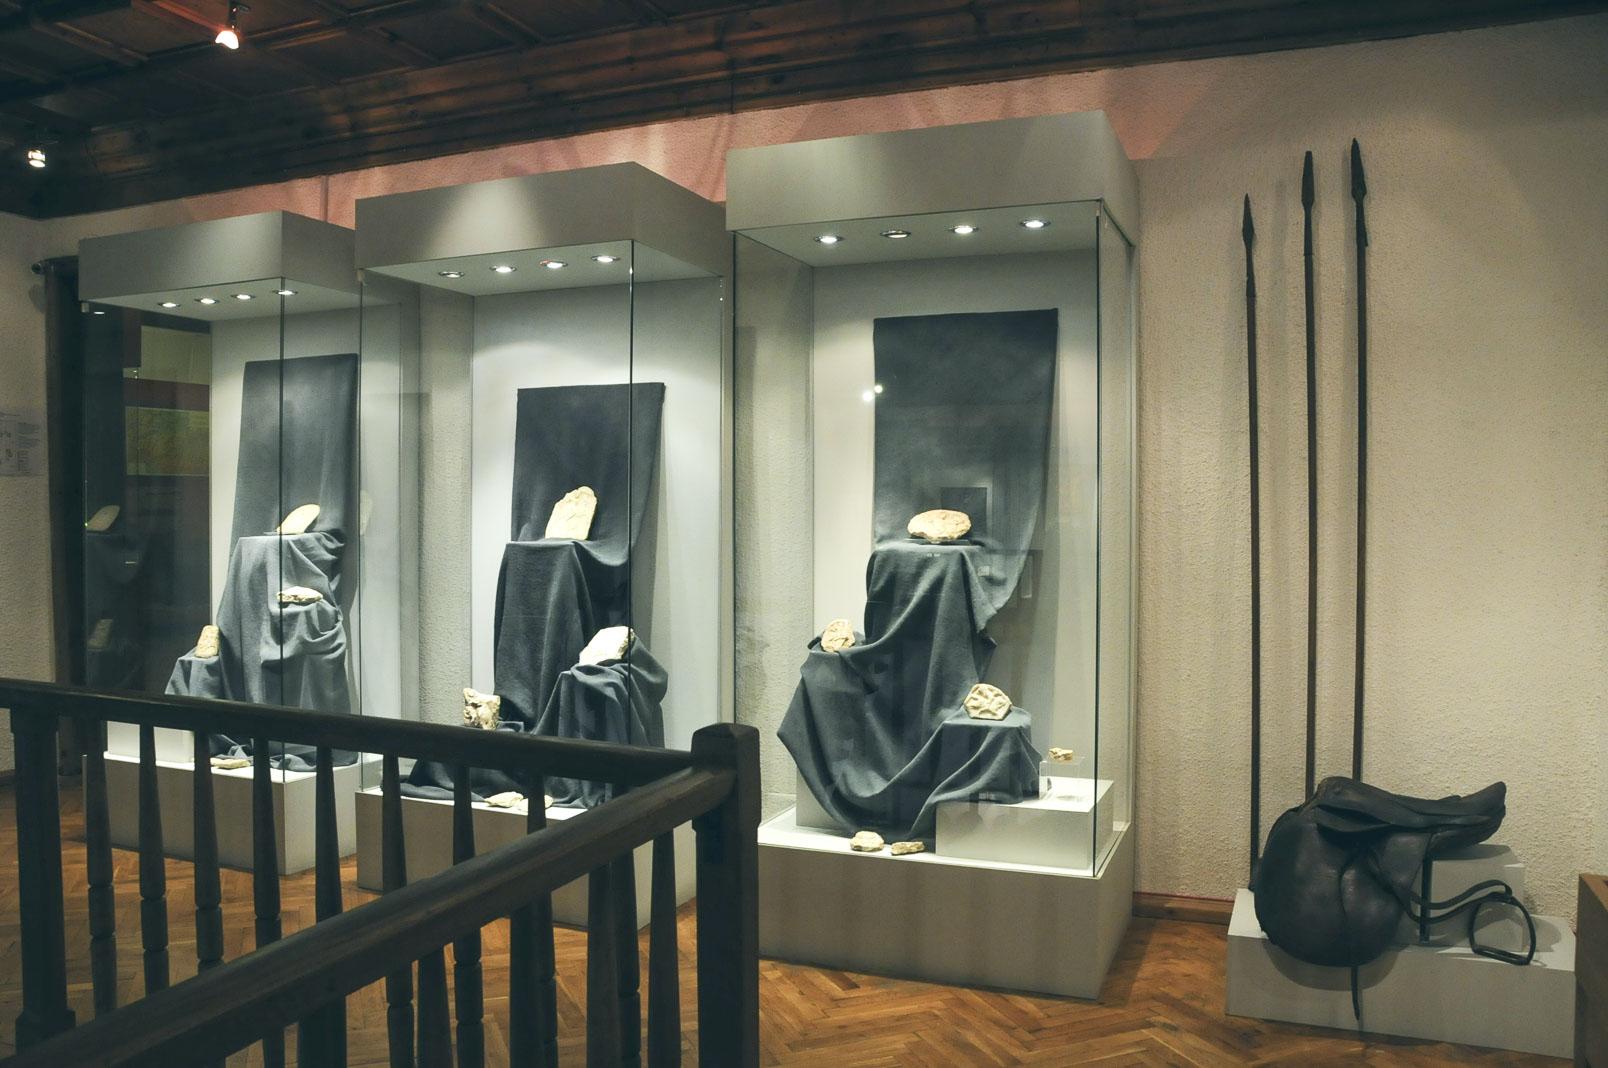 troyan-museum-jivotat-na-edna-idea-23